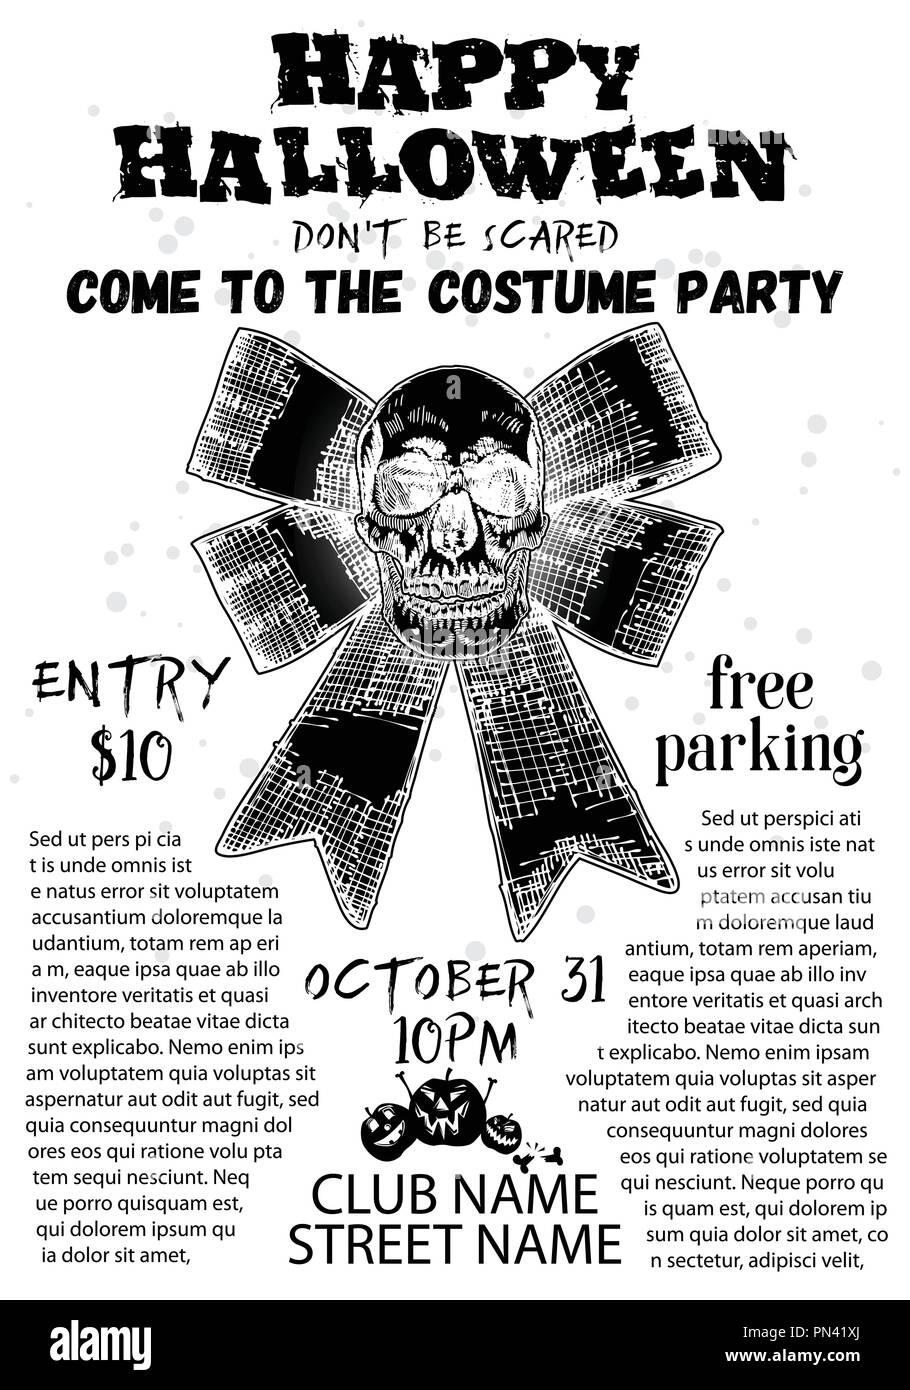 Halloween Party Ticket Invitation Stock Photos & Halloween Party ...